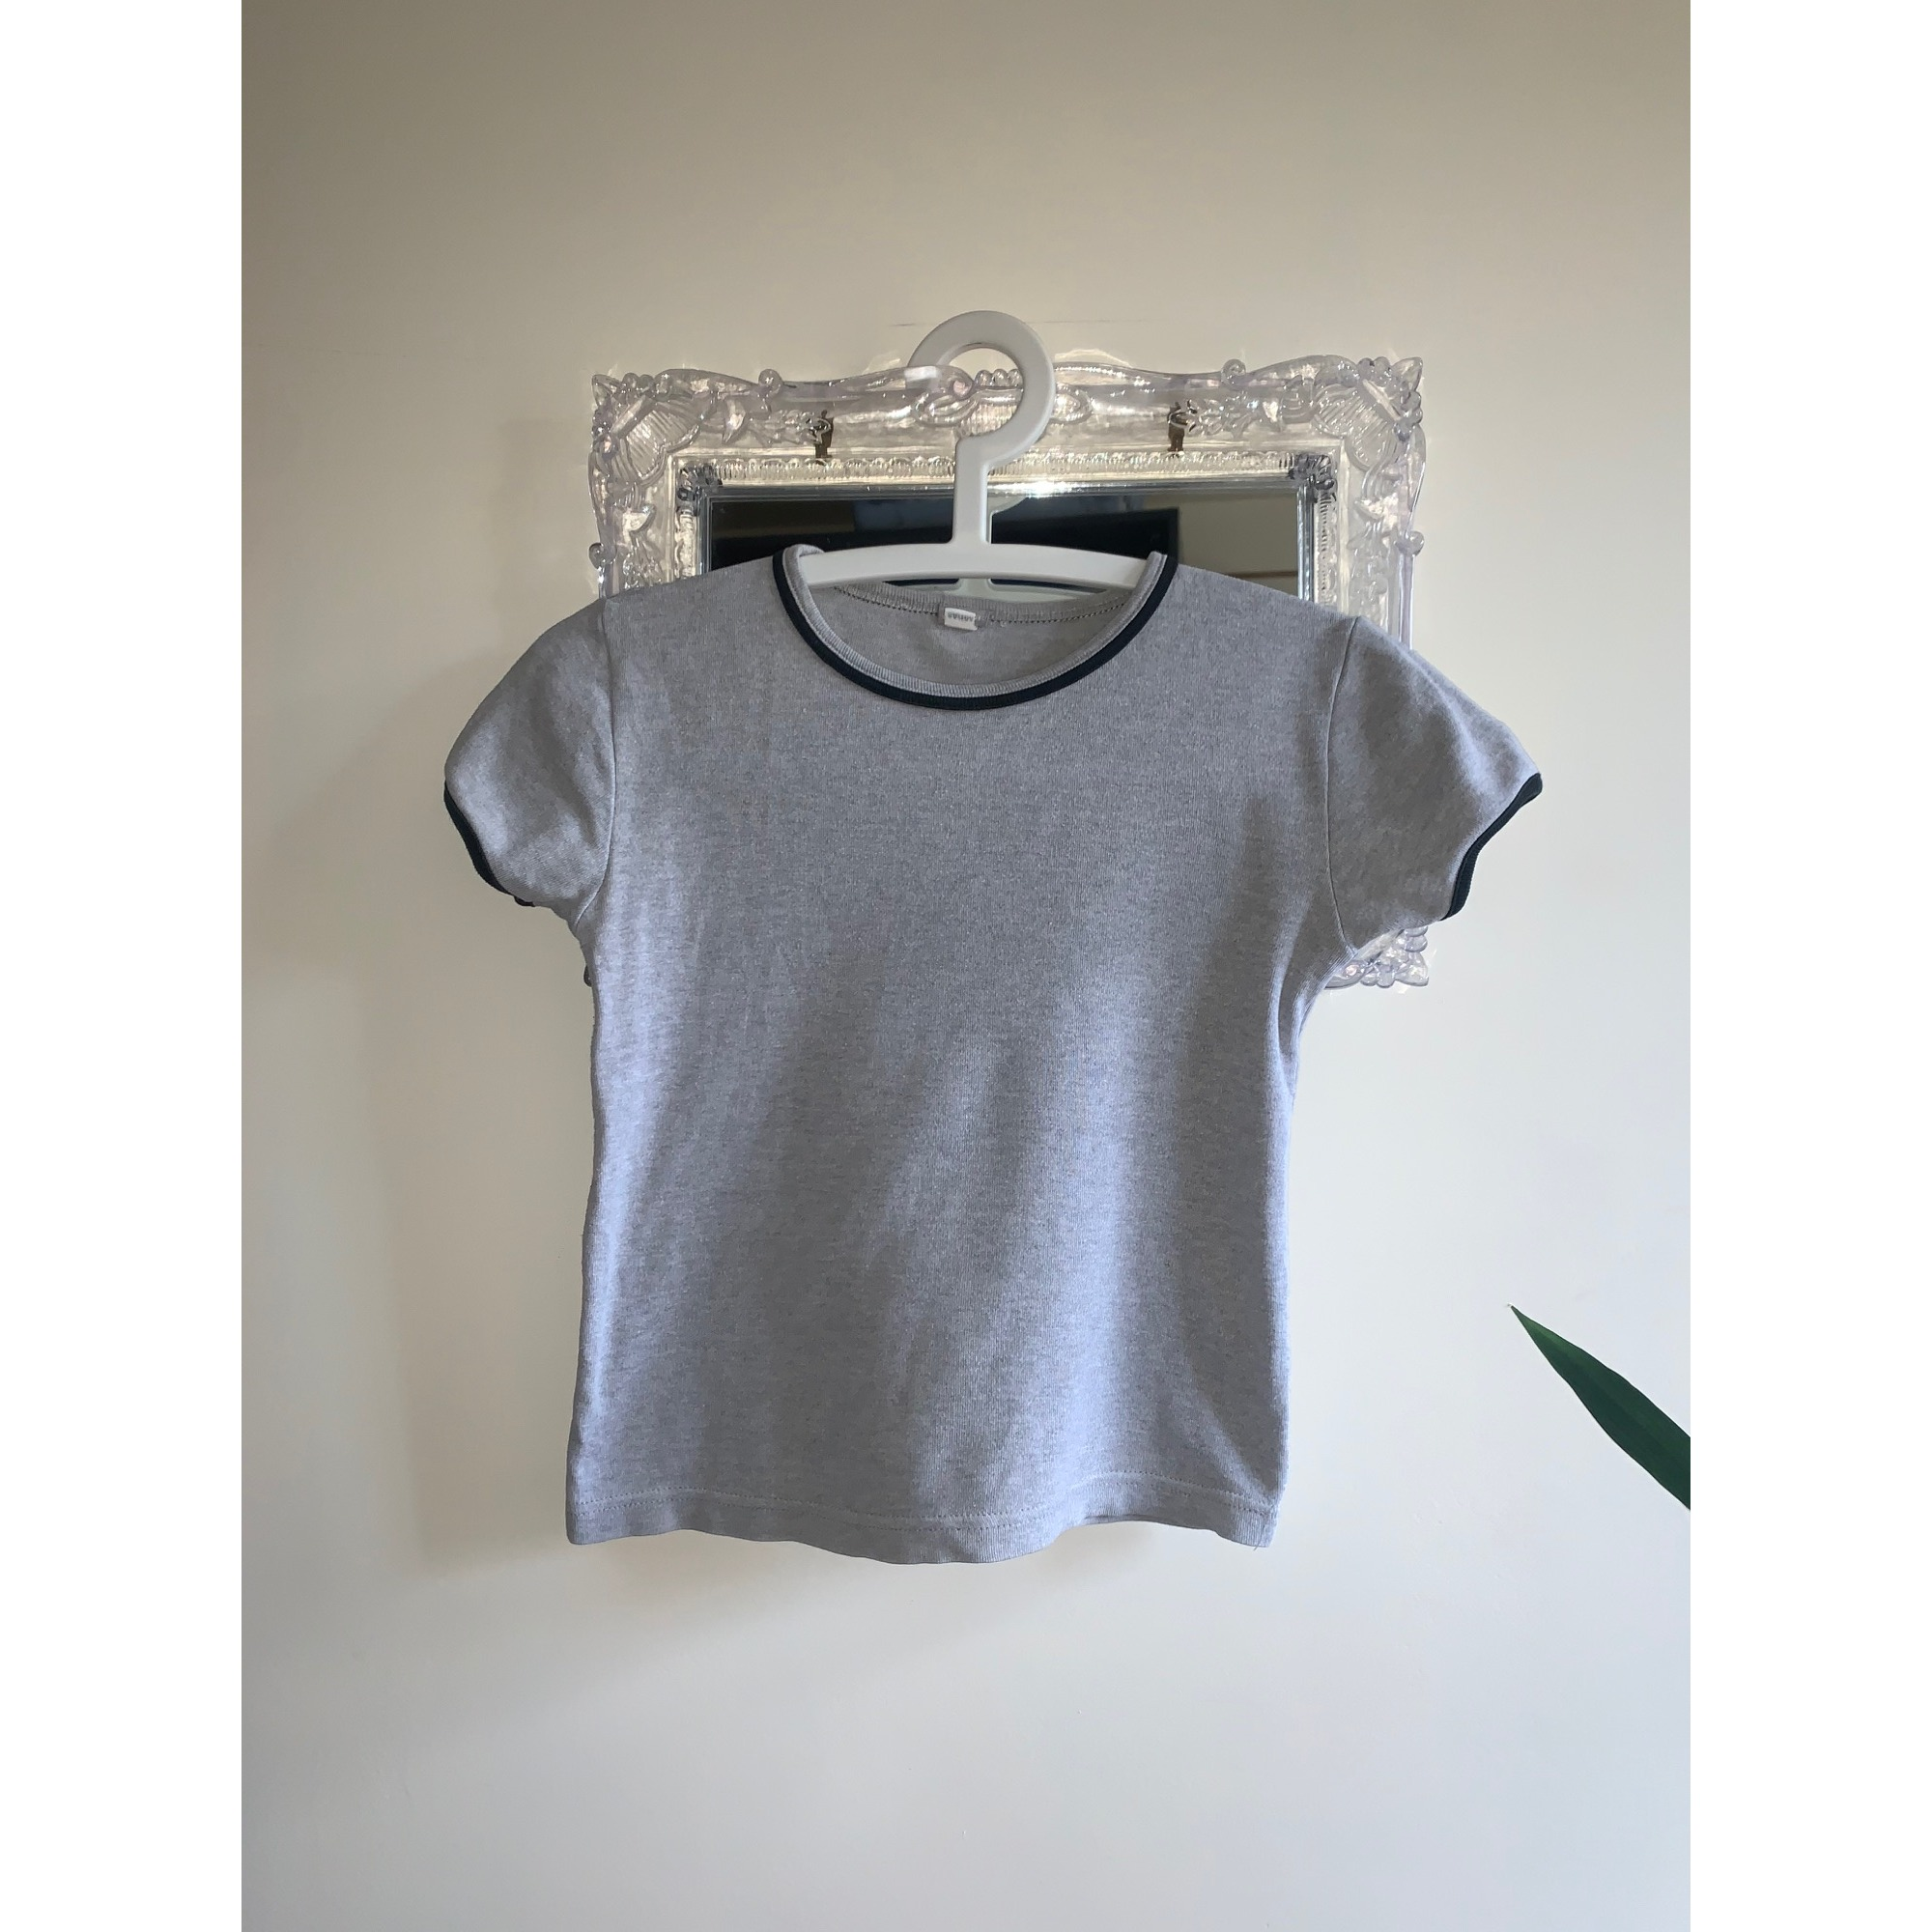 Top, Tee-shirt VERTBAUDET Gris, anthracite